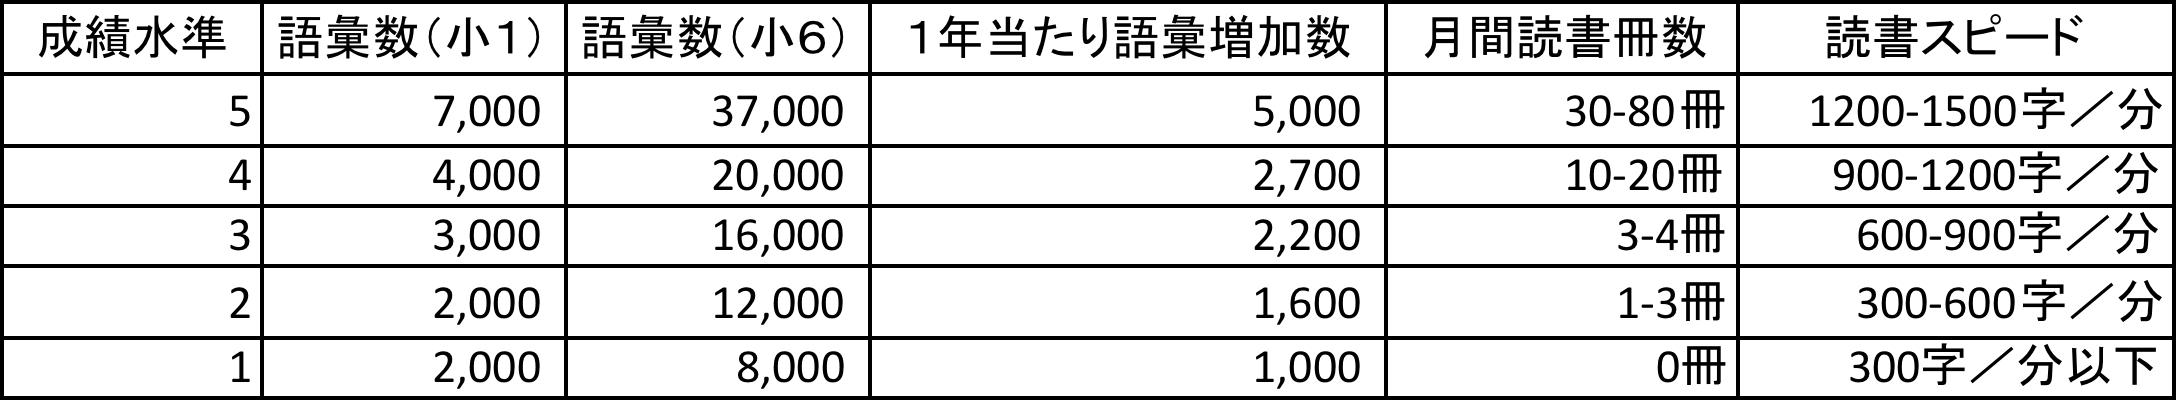 shougaku-goi1.jpg